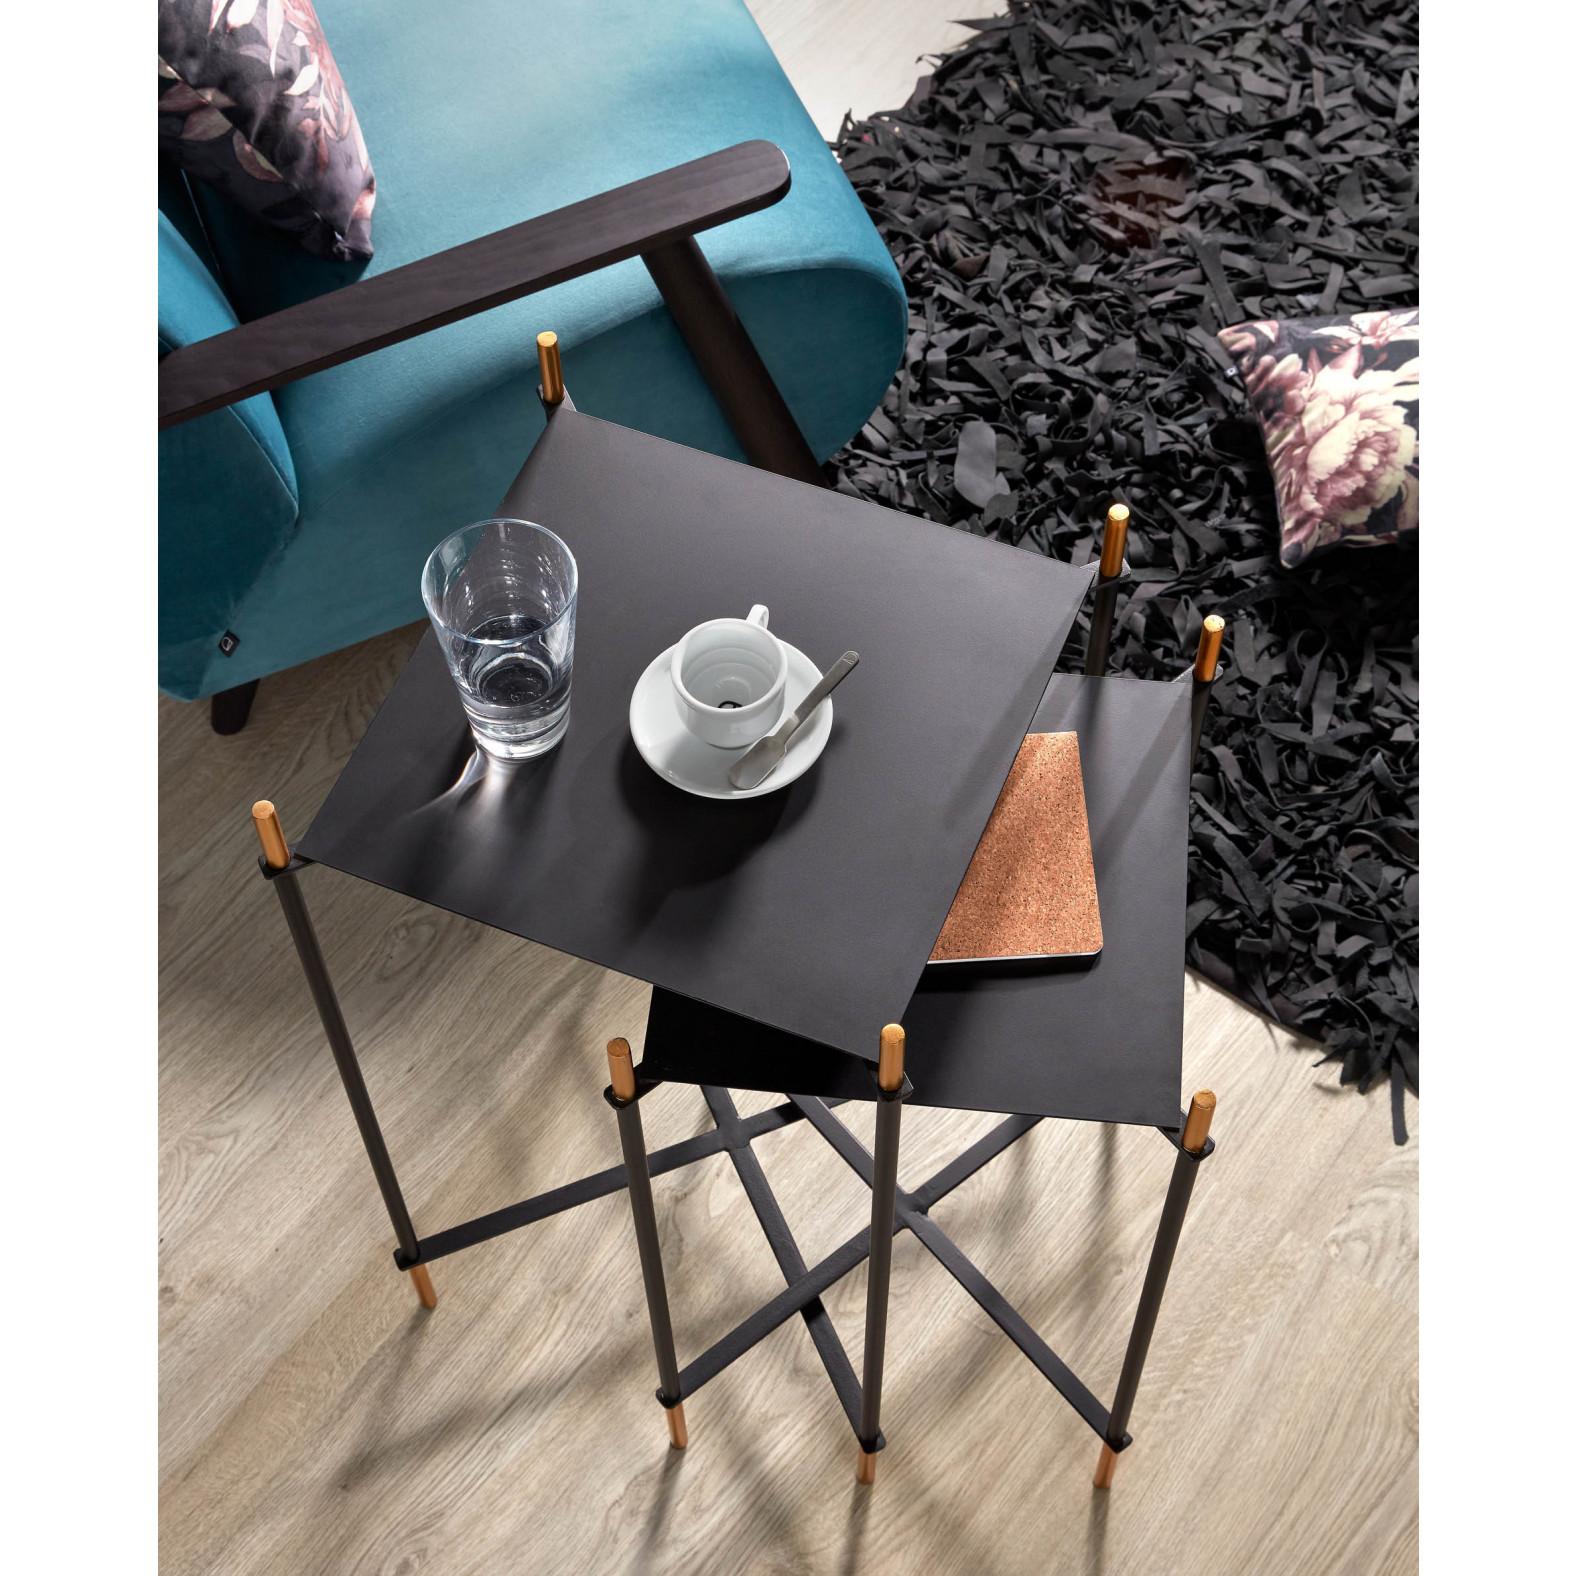 Set of 2 Side Tables Dagnen | Black